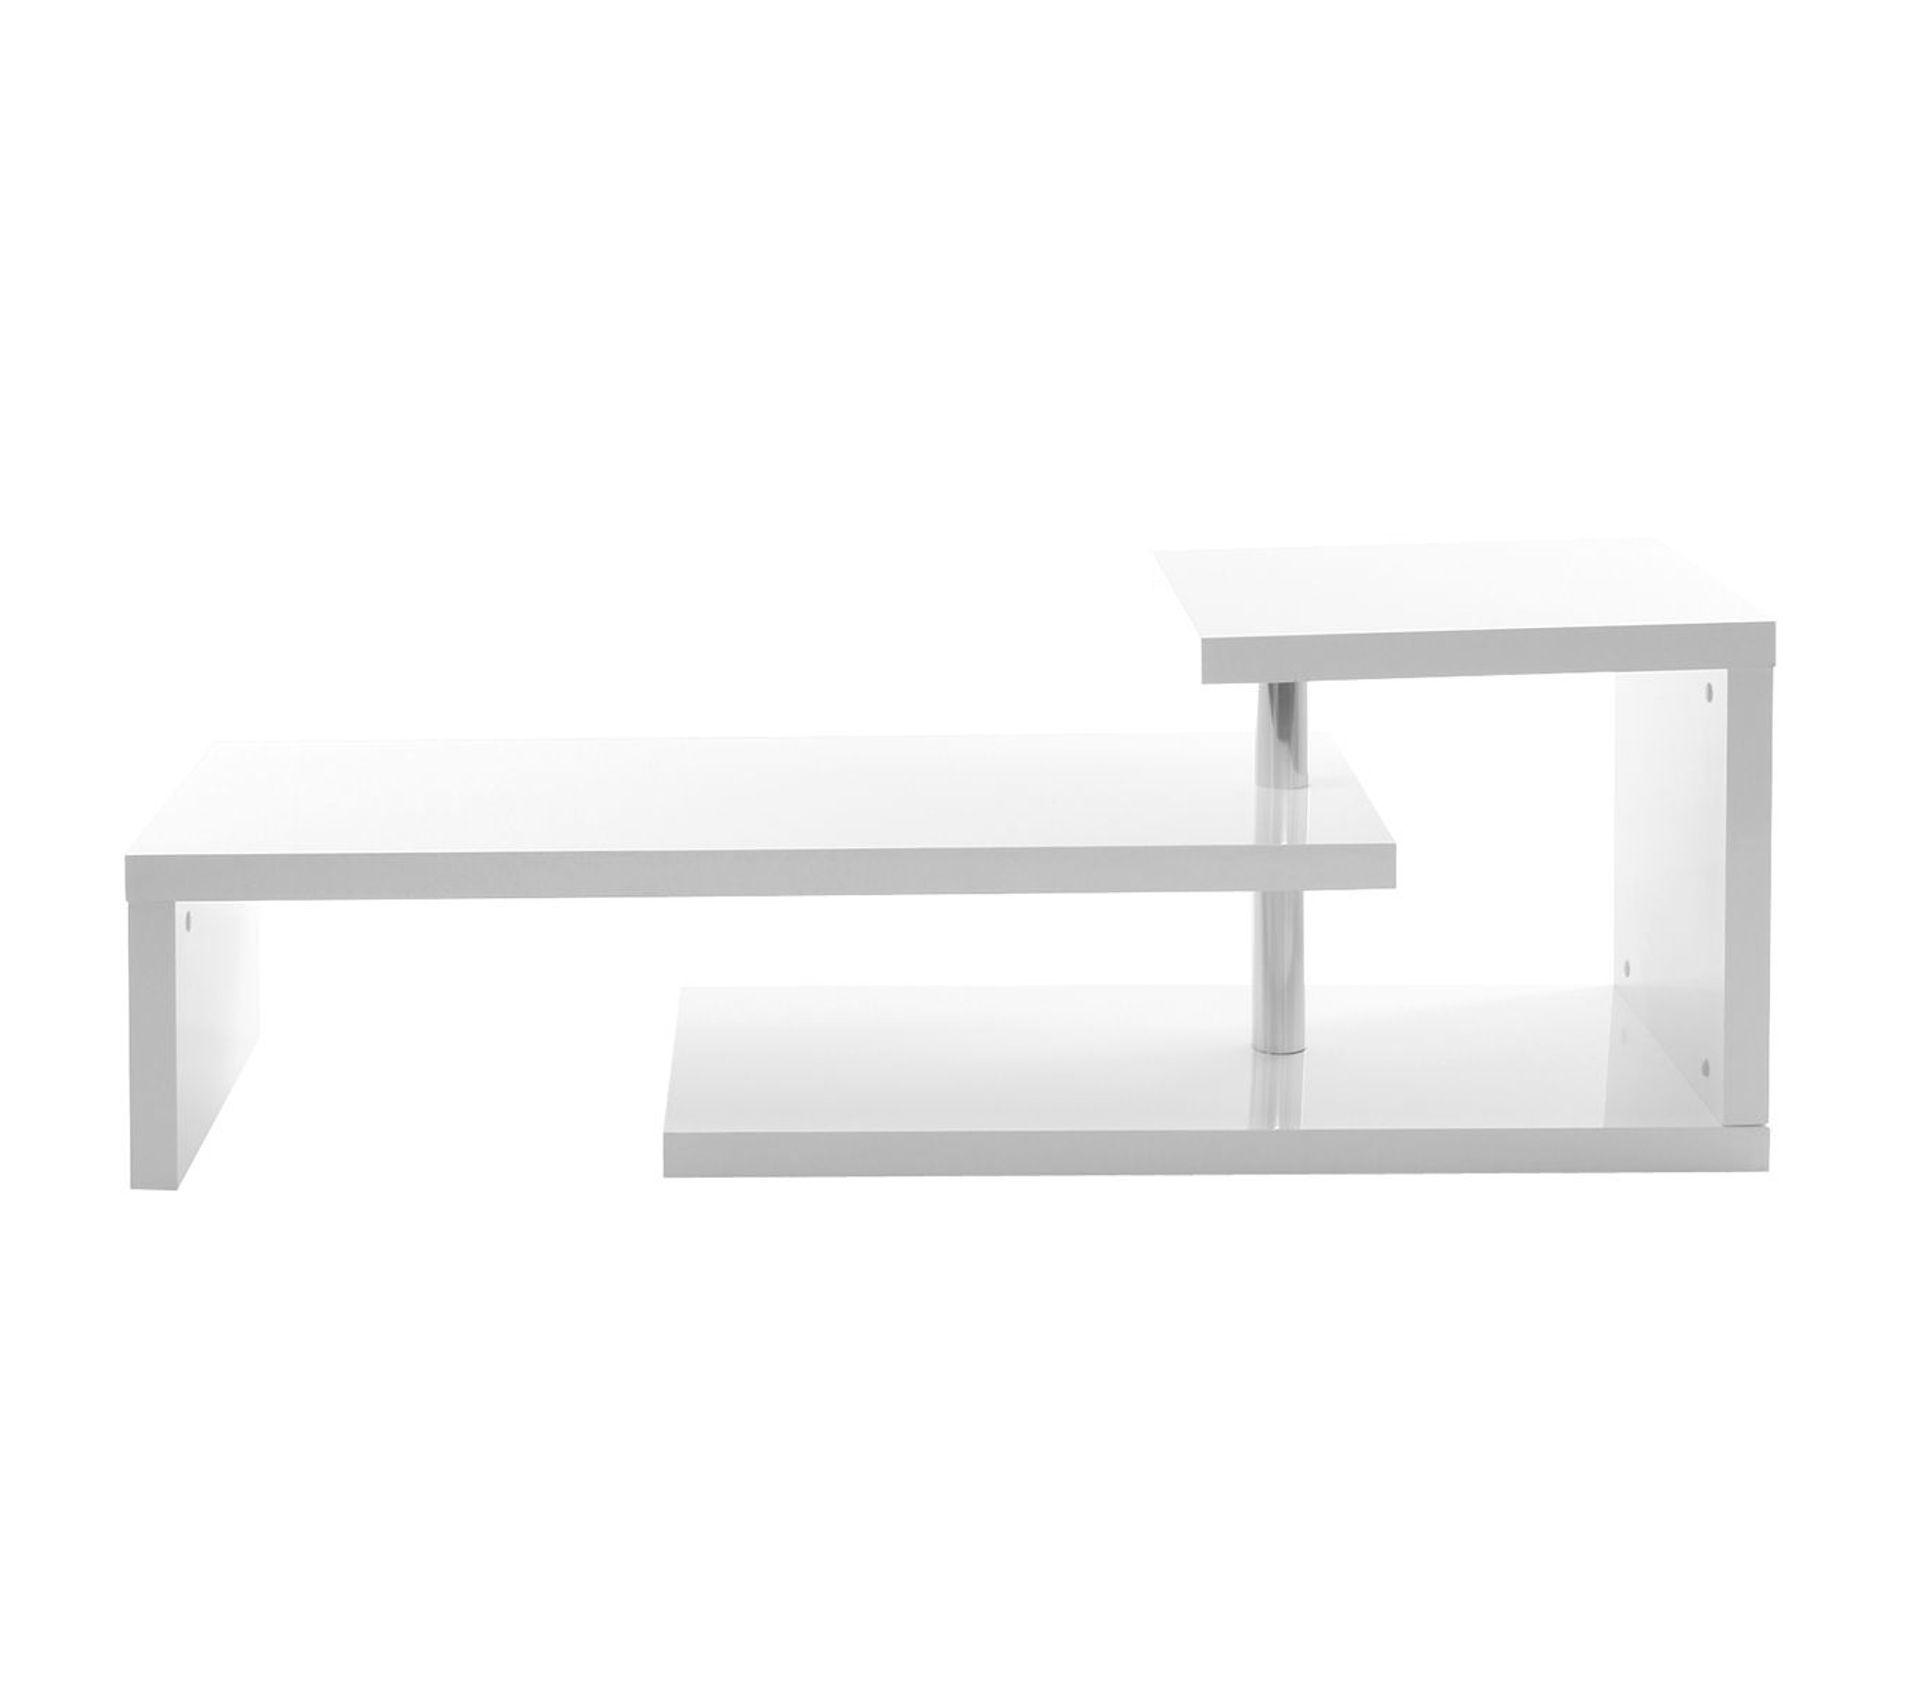 Objet Deco Laque Blanc meuble tv design laqué blanc turn